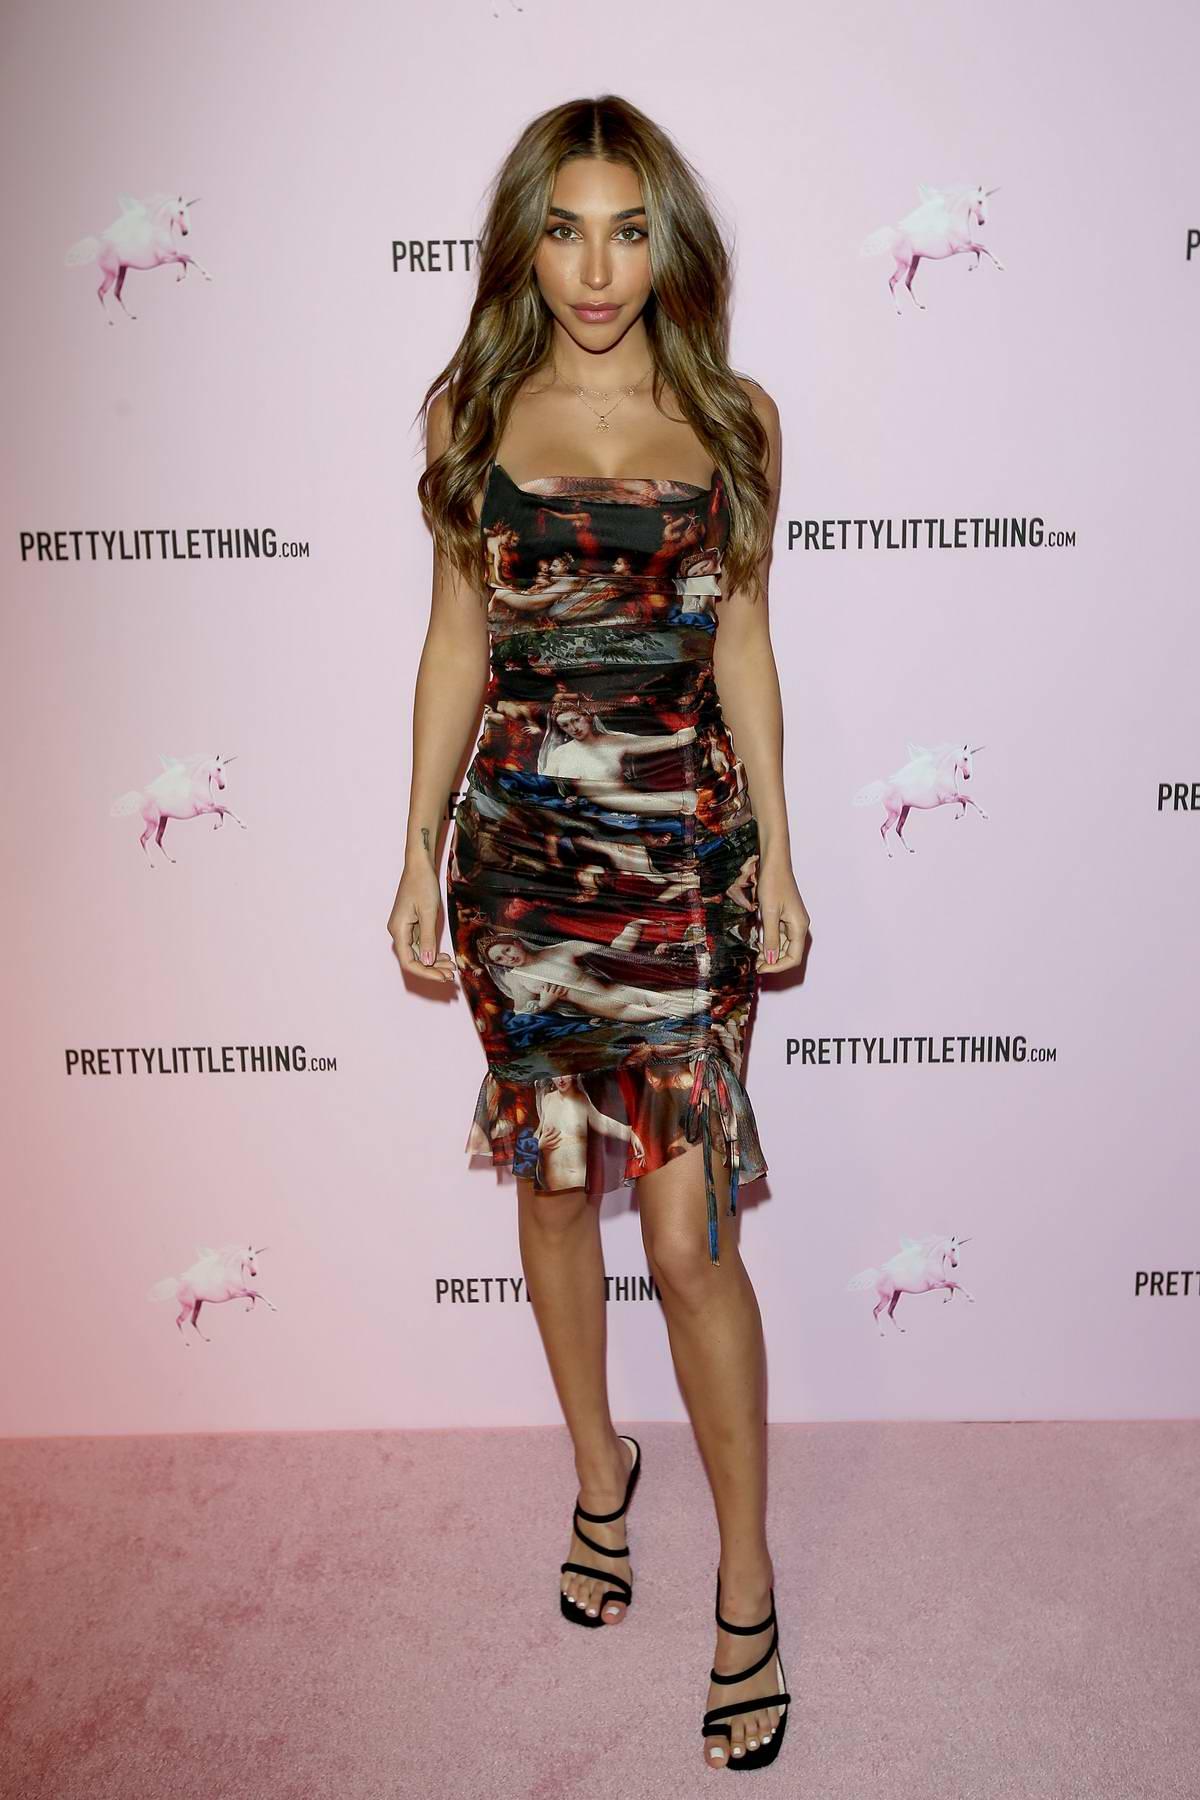 Chantel Jeffries attends PrettyLittleThing x Chantel Jeffries launch event in Los Angeles